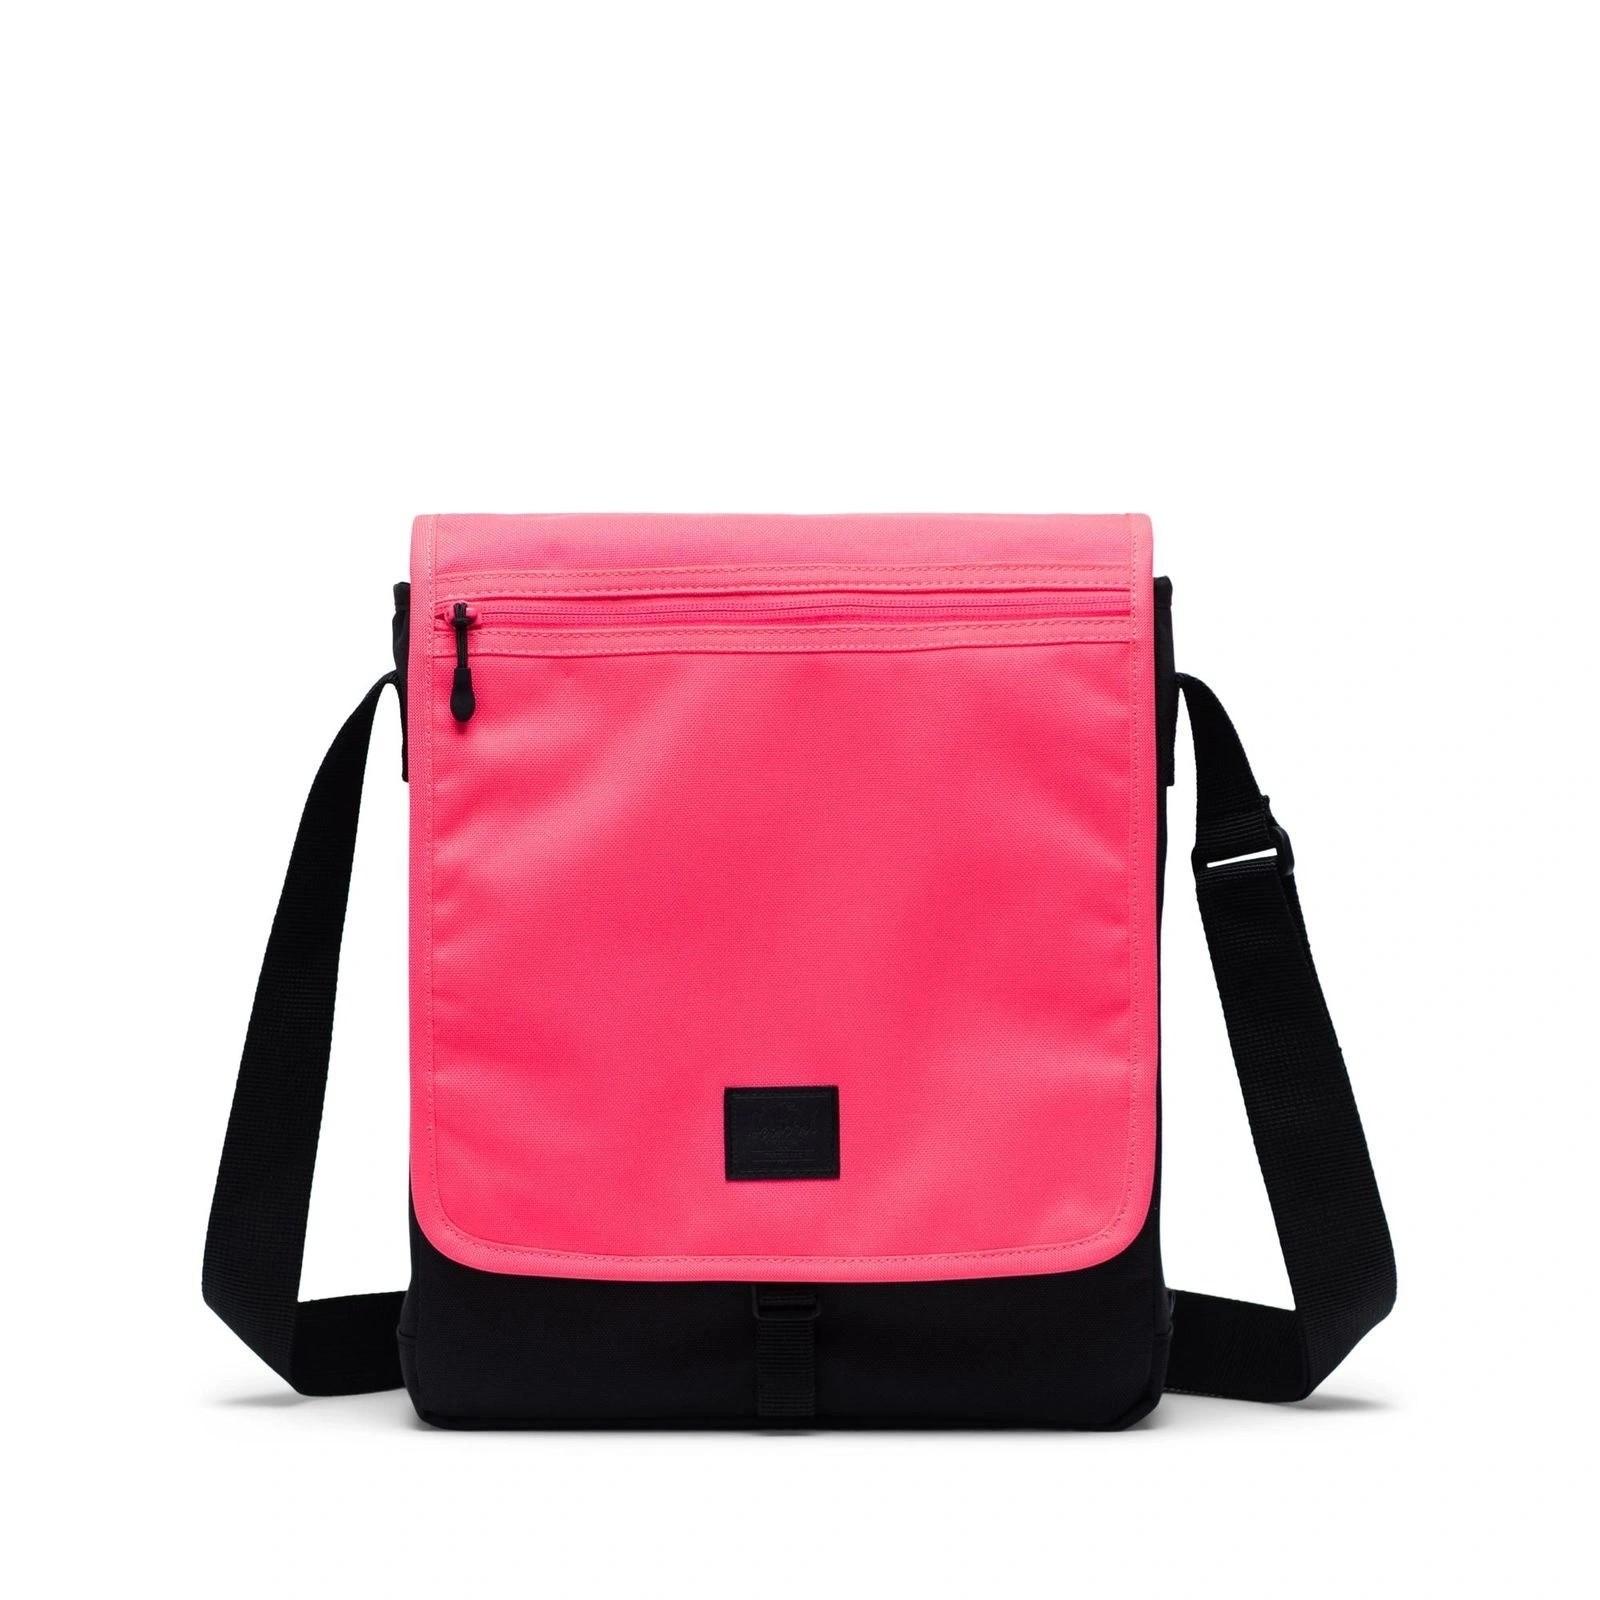 Herschel Lane Neon Pink/Black